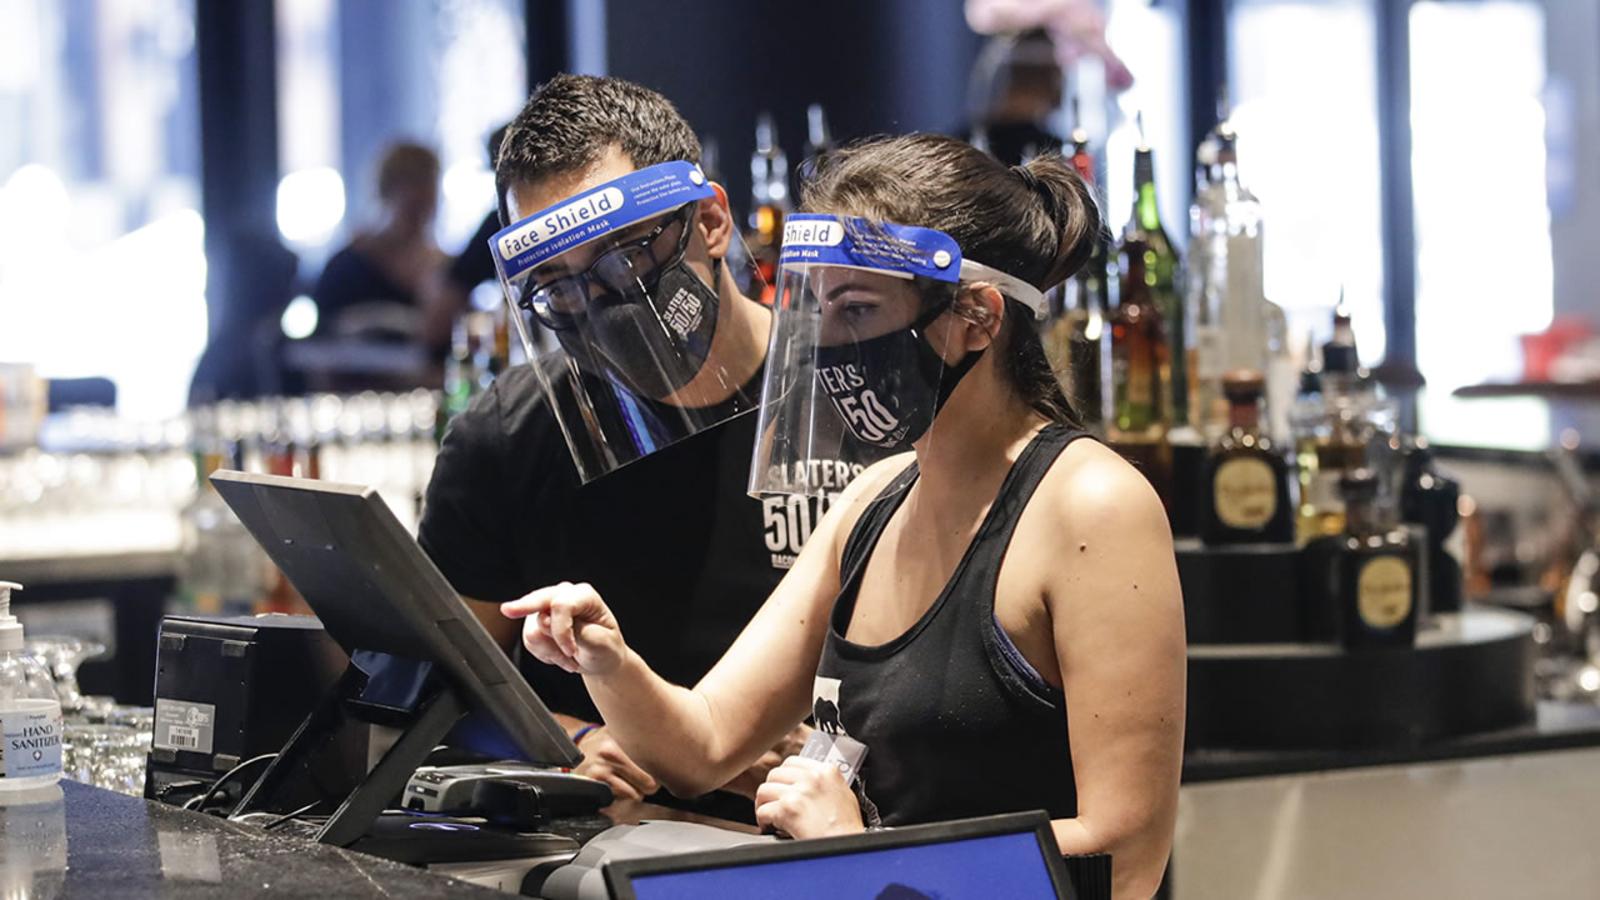 Will sporting masks assist California squash 2nd coronavirus surge? UCSF's Dr. Wachter explains - KGO-TV thumbnail